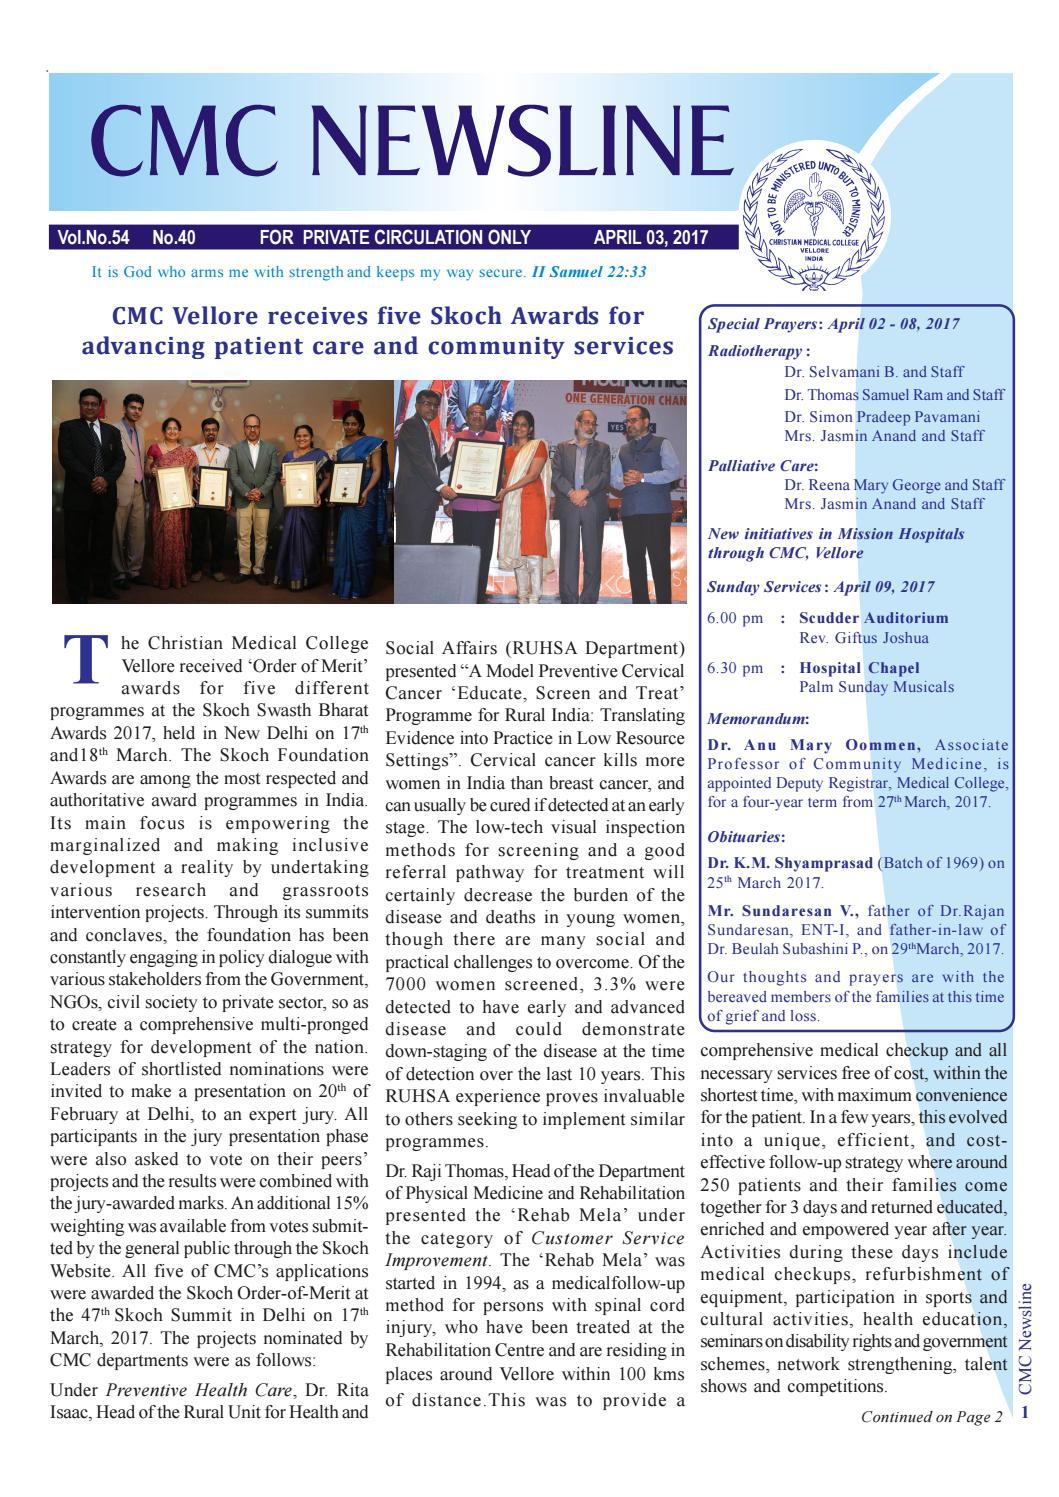 Cmc newsline 3 april 2017 vol 54 no 40 by vellore cmc foundation cmc newsline 3 april 2017 vol 54 no 40 by vellore cmc foundation issuu aiddatafo Choice Image